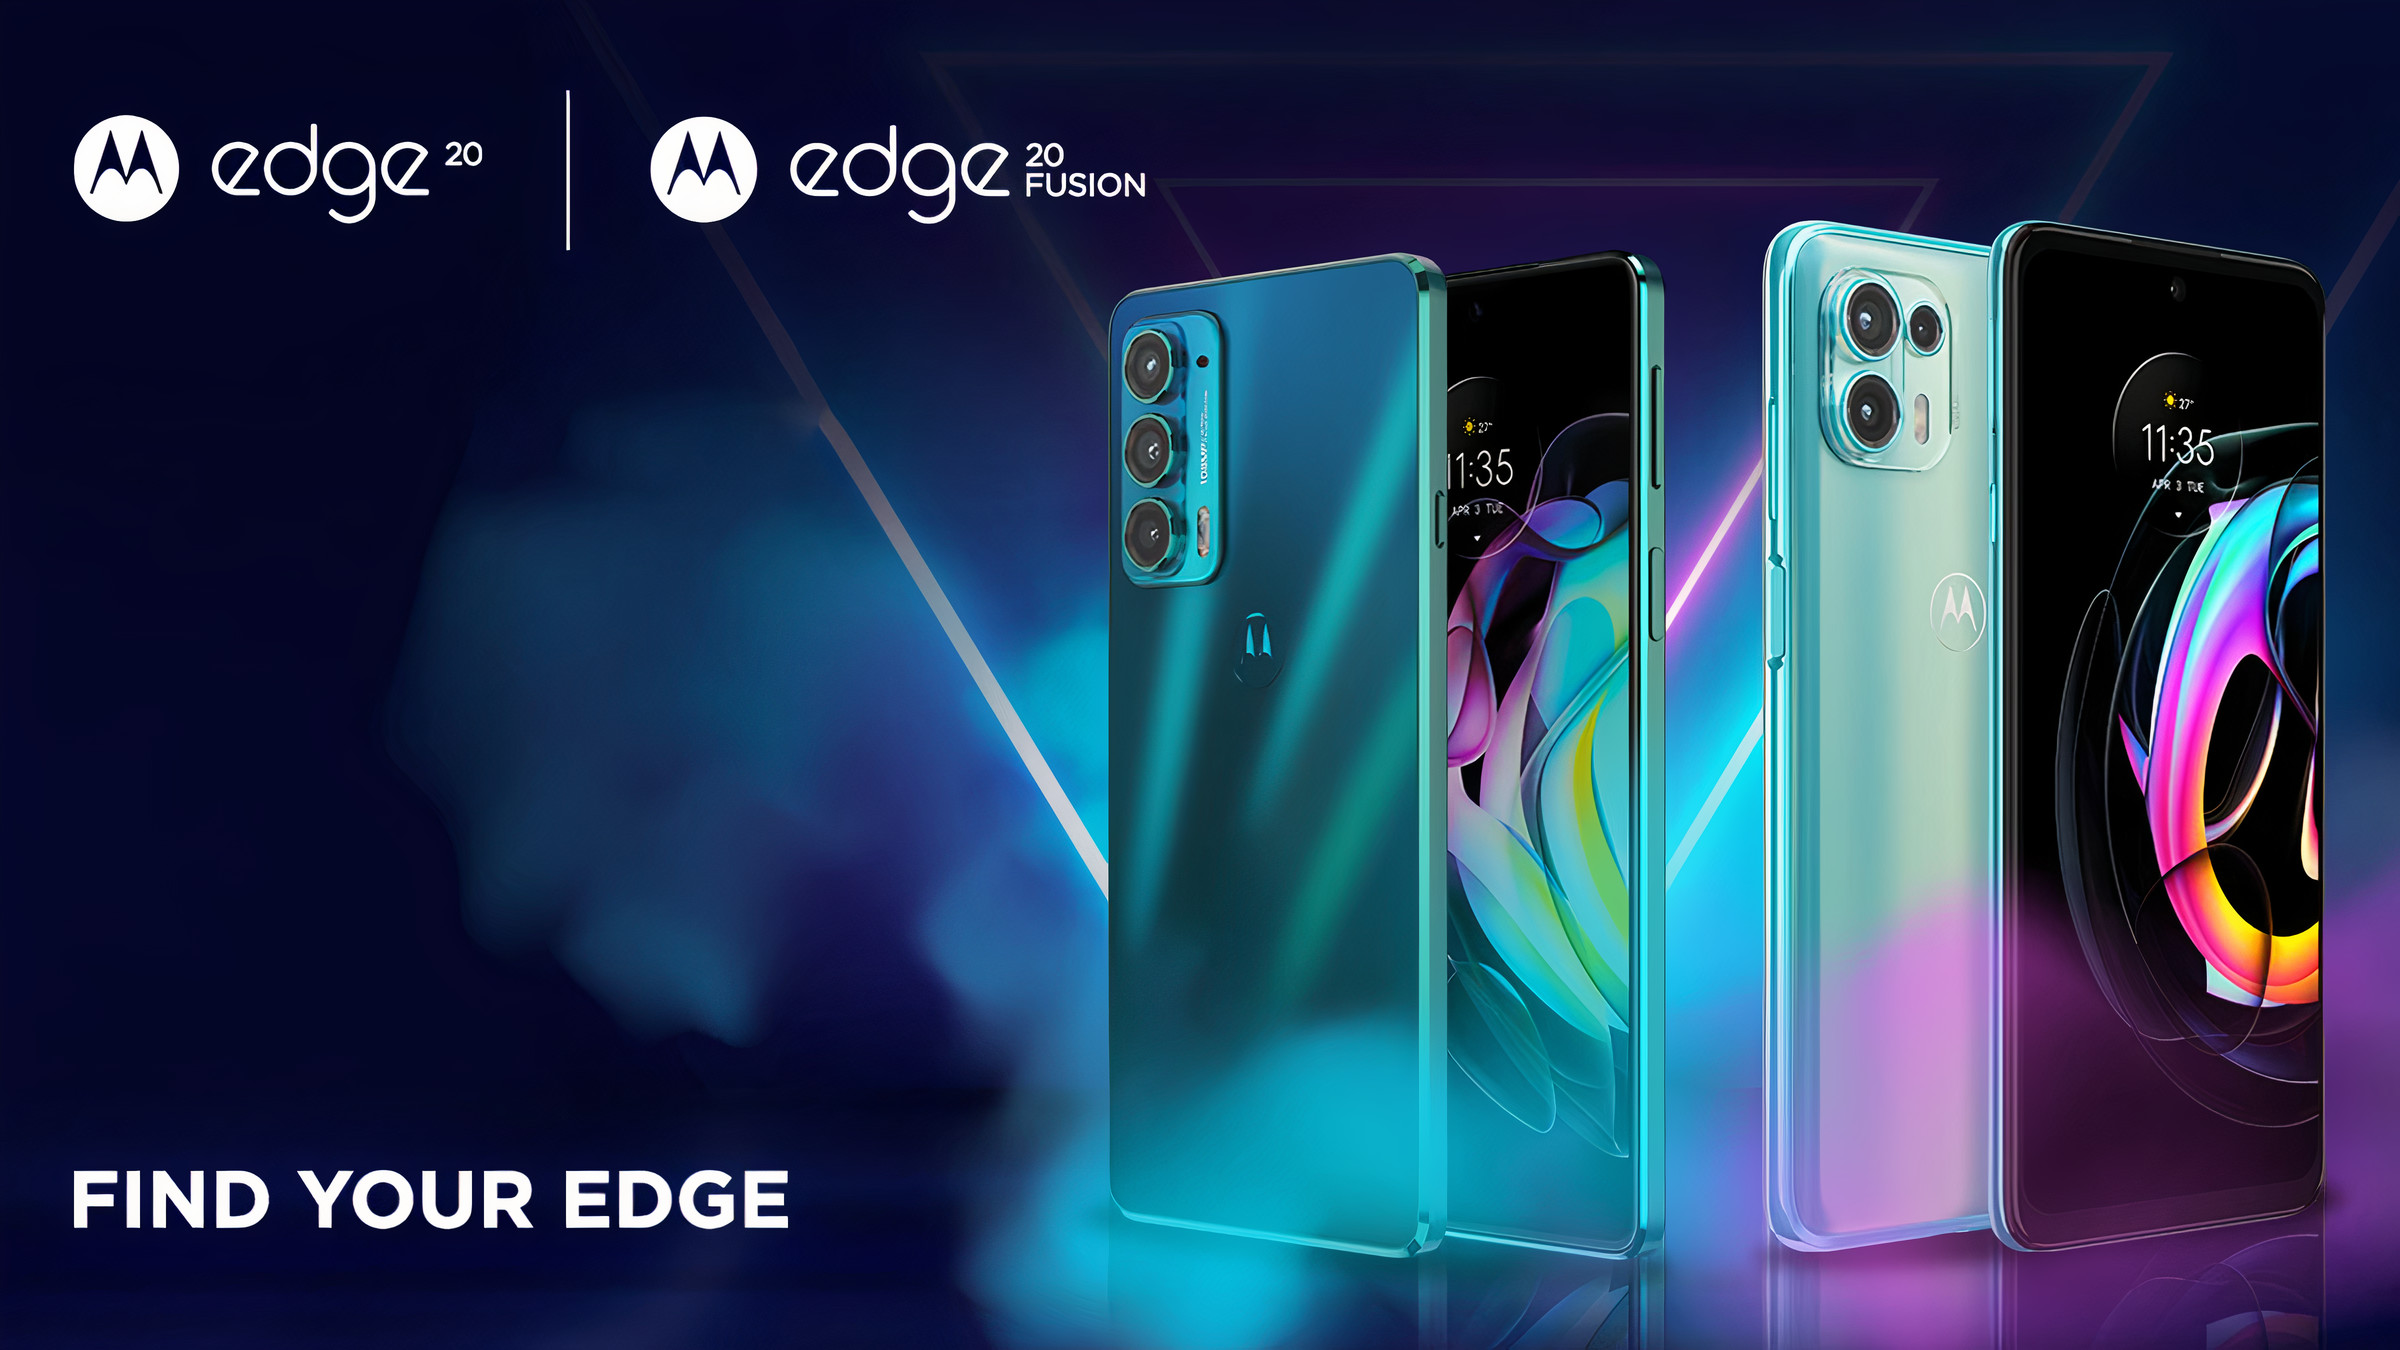 Banner Image of Motorola Edge 20 and Edge 20 Fusion